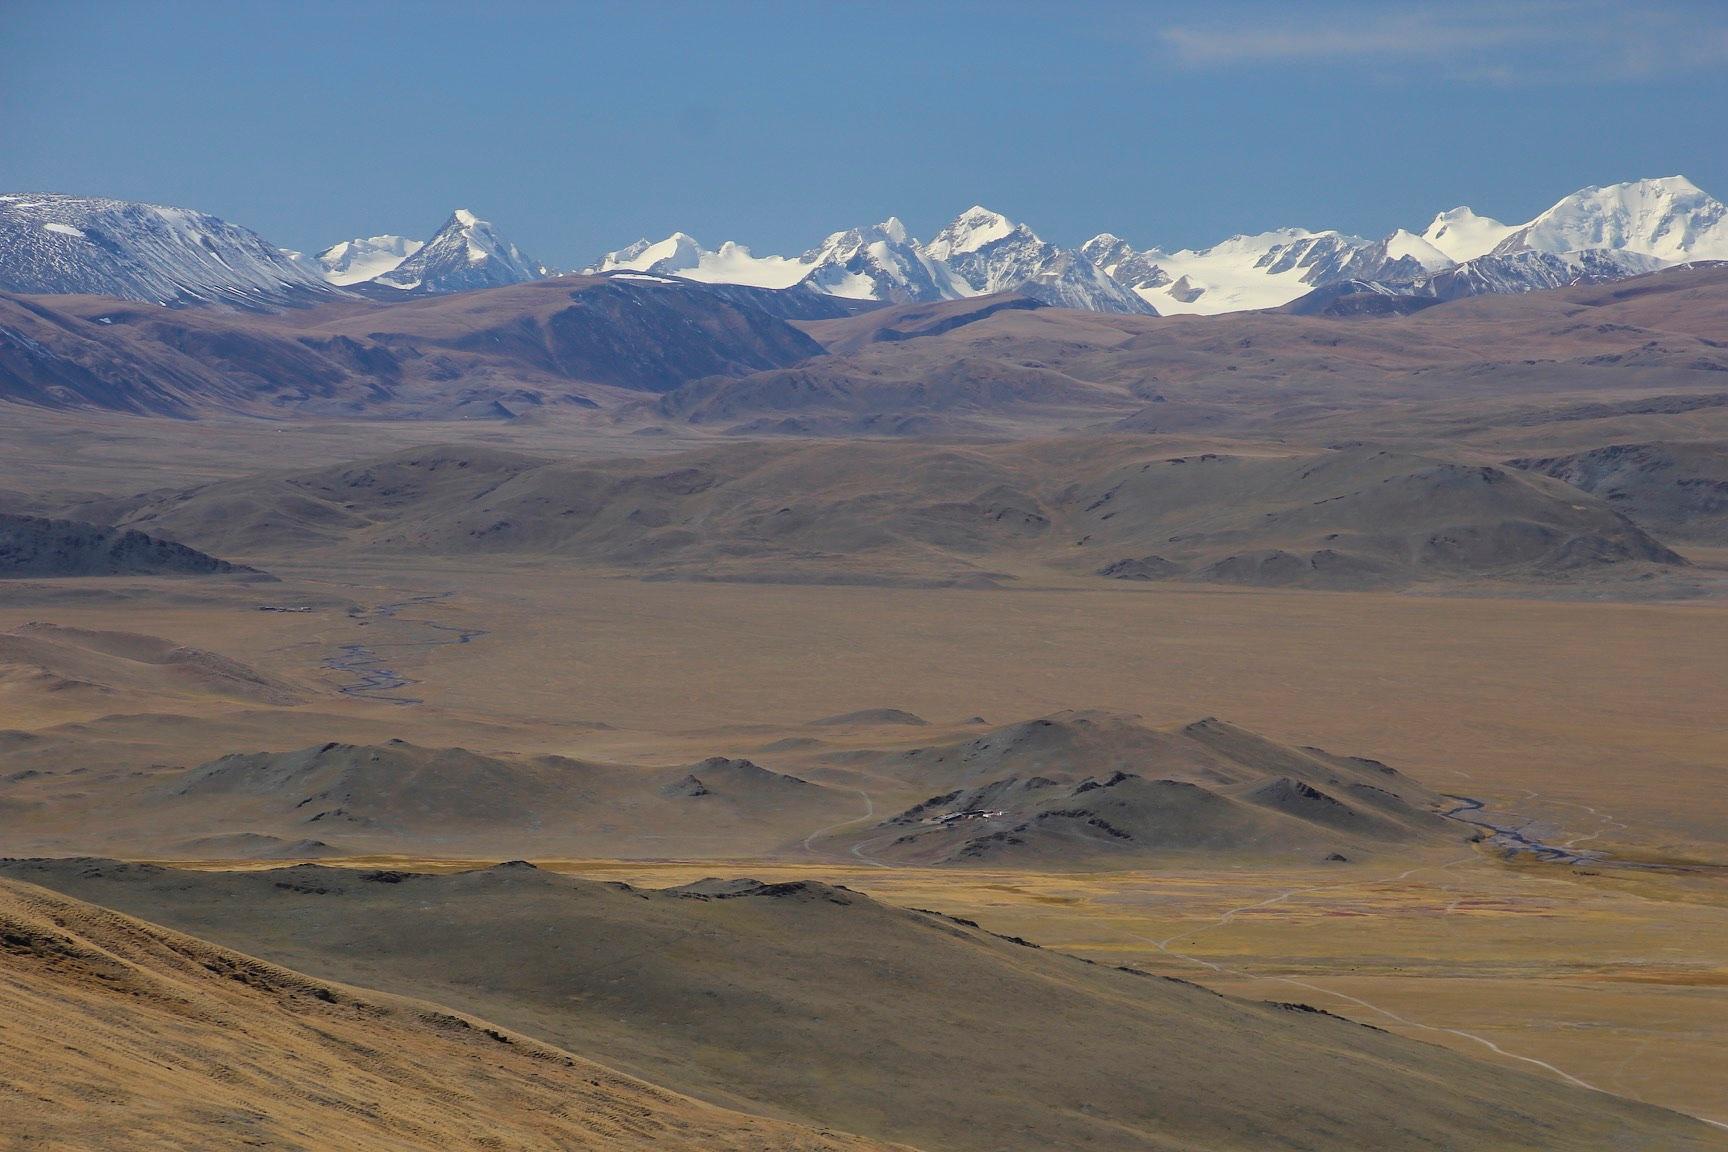 The Altai Range